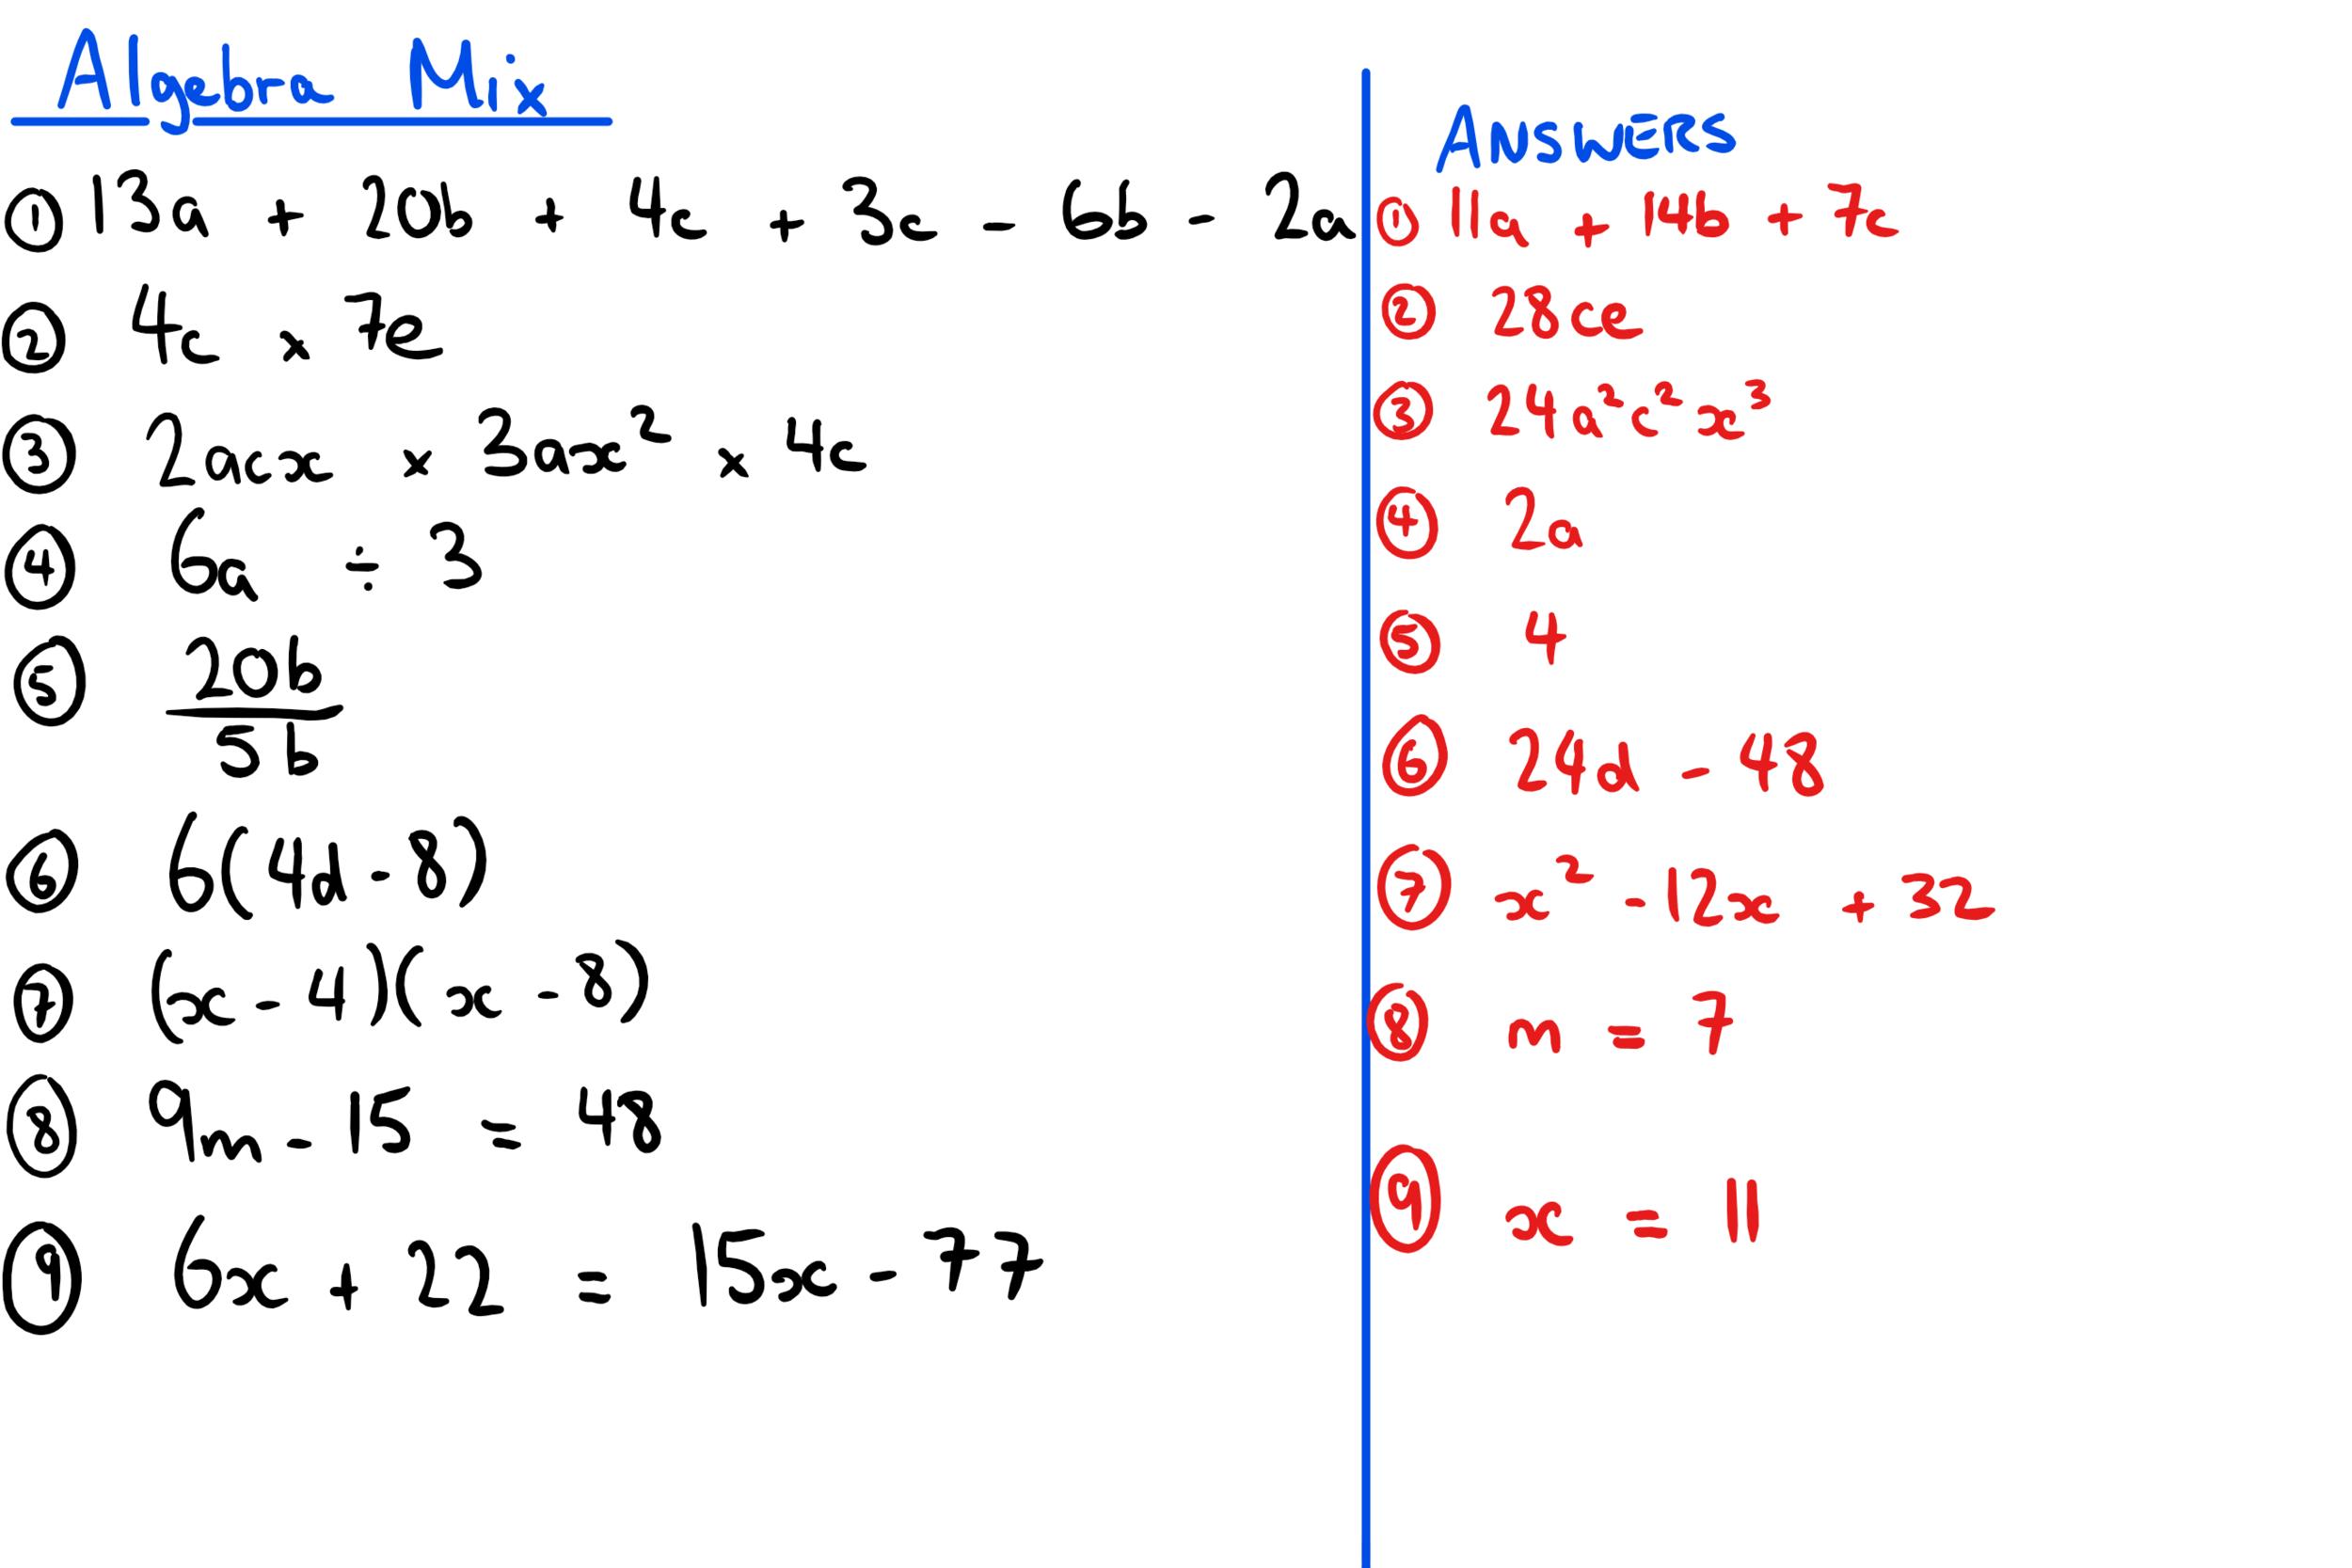 ALGEBRA MIX 18TH JAN ANSWERS